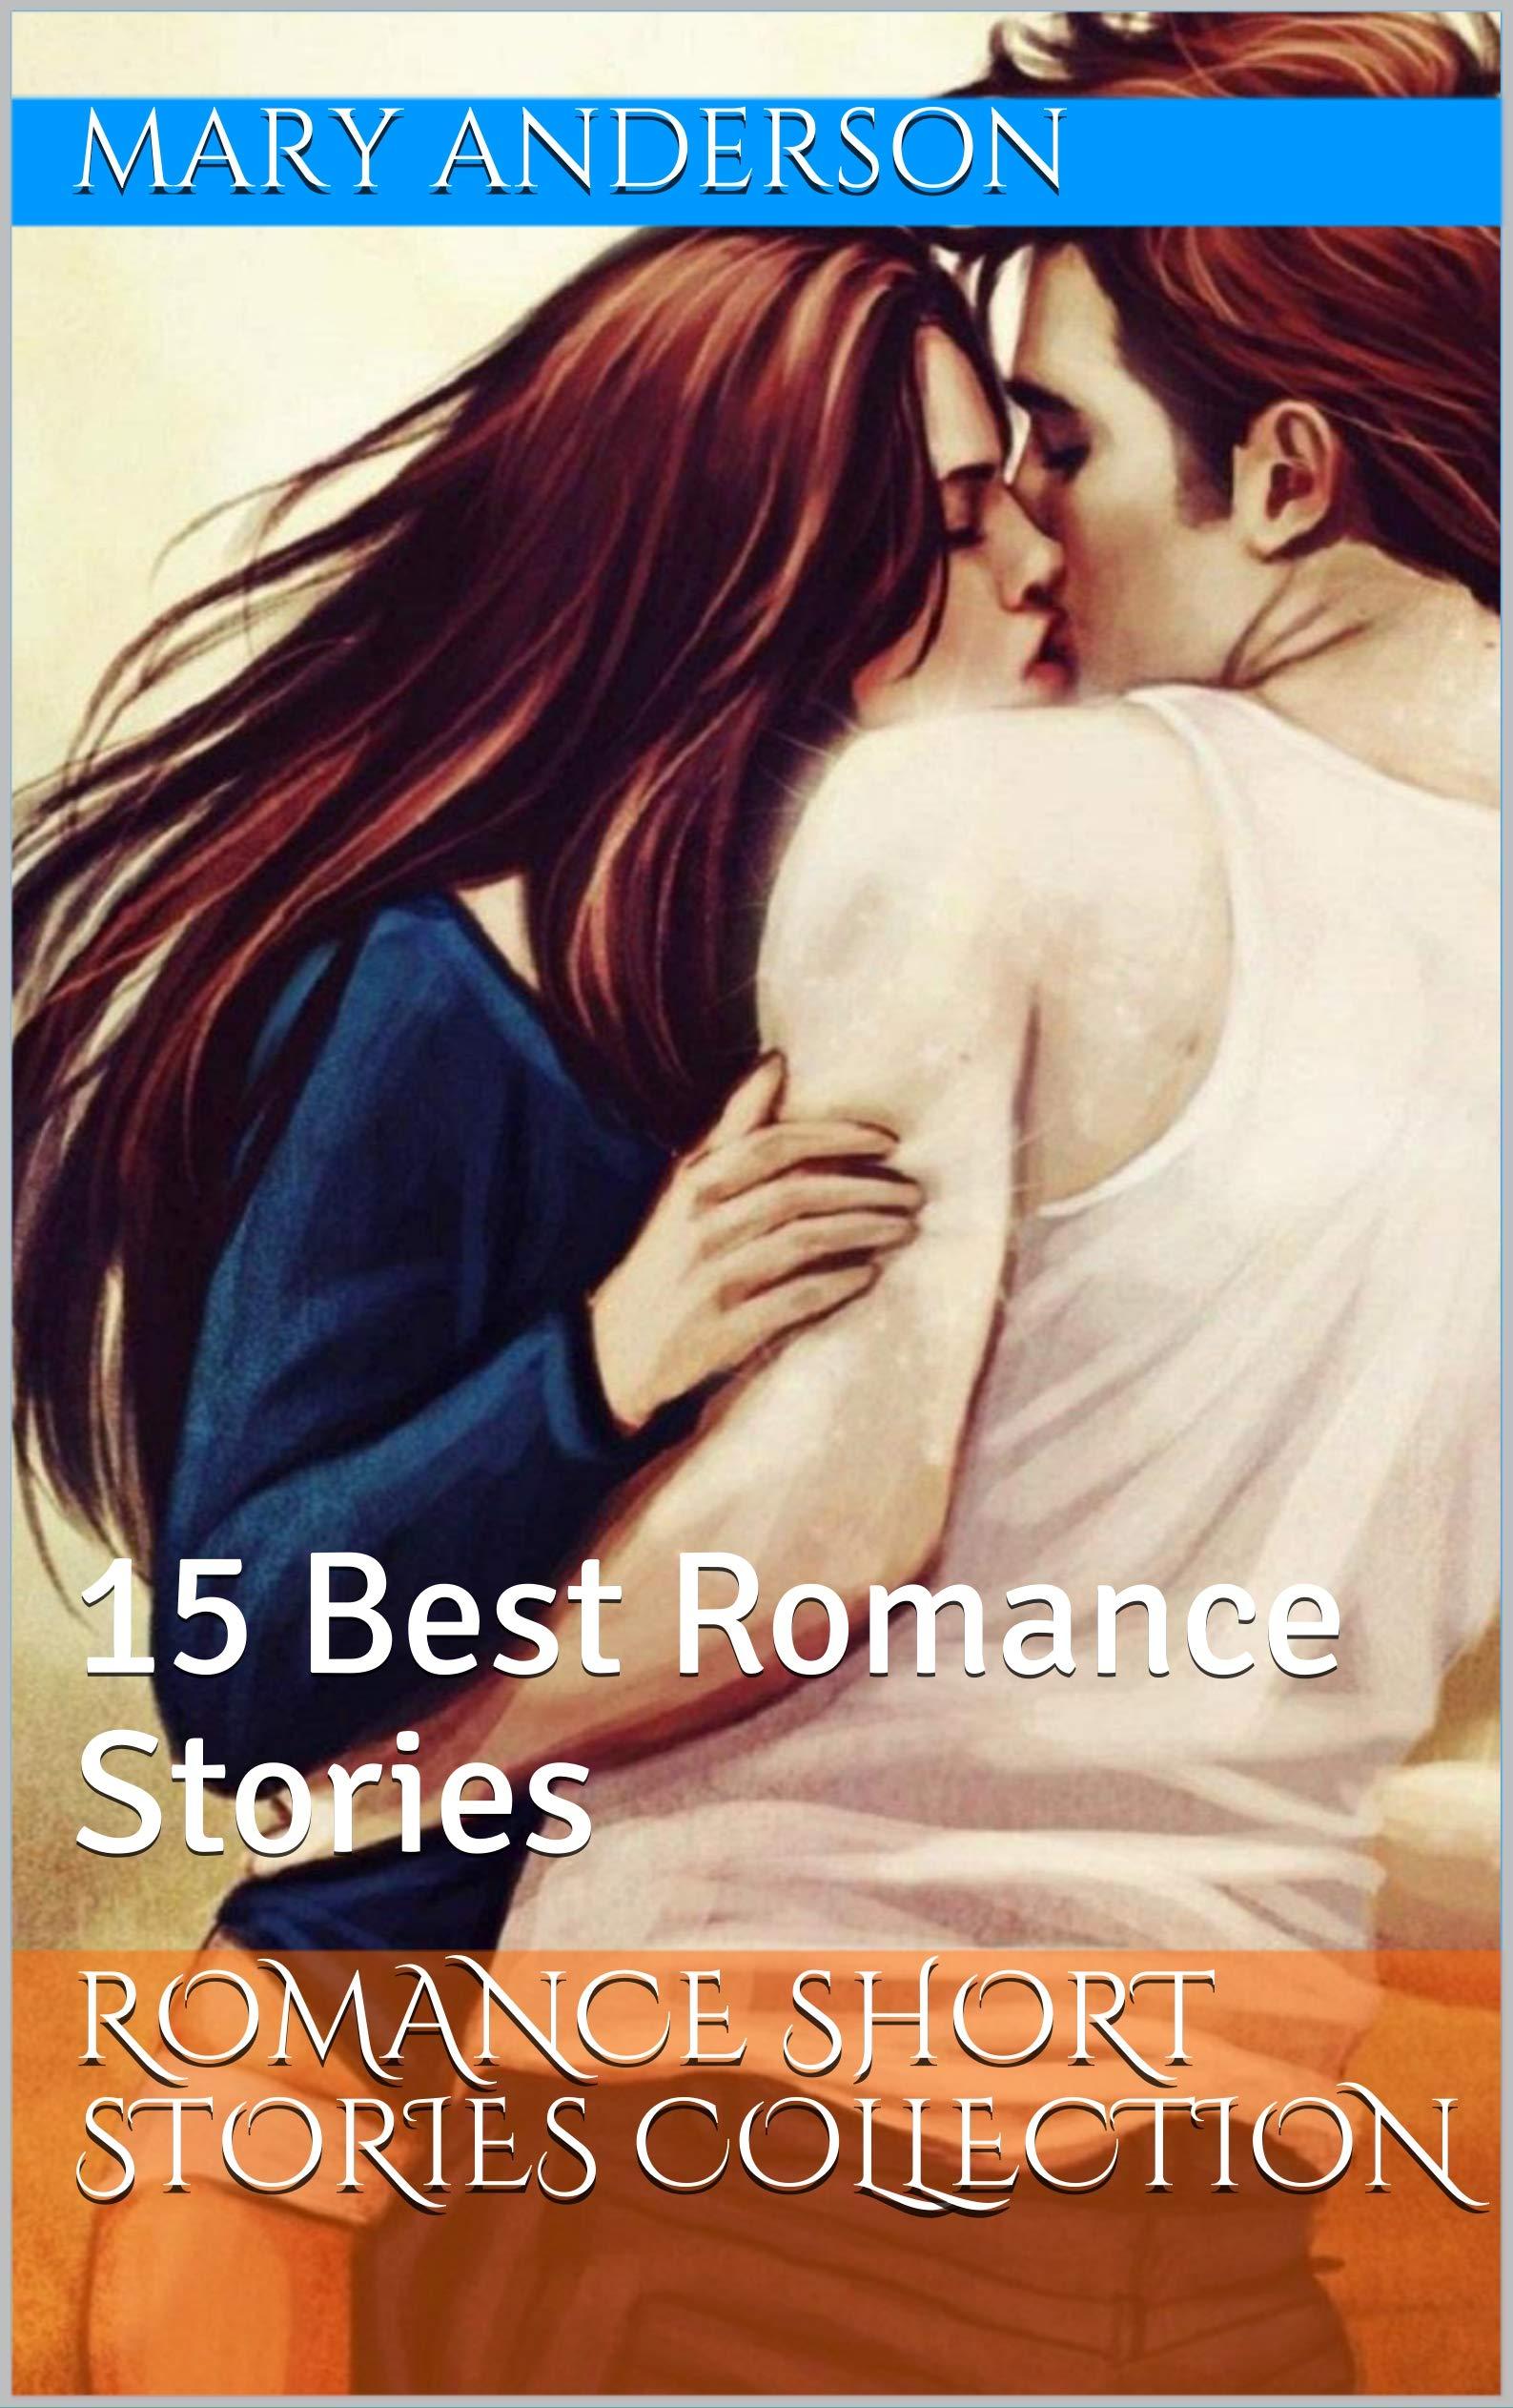 Romance Short Stories : 15 Best Romance Stories